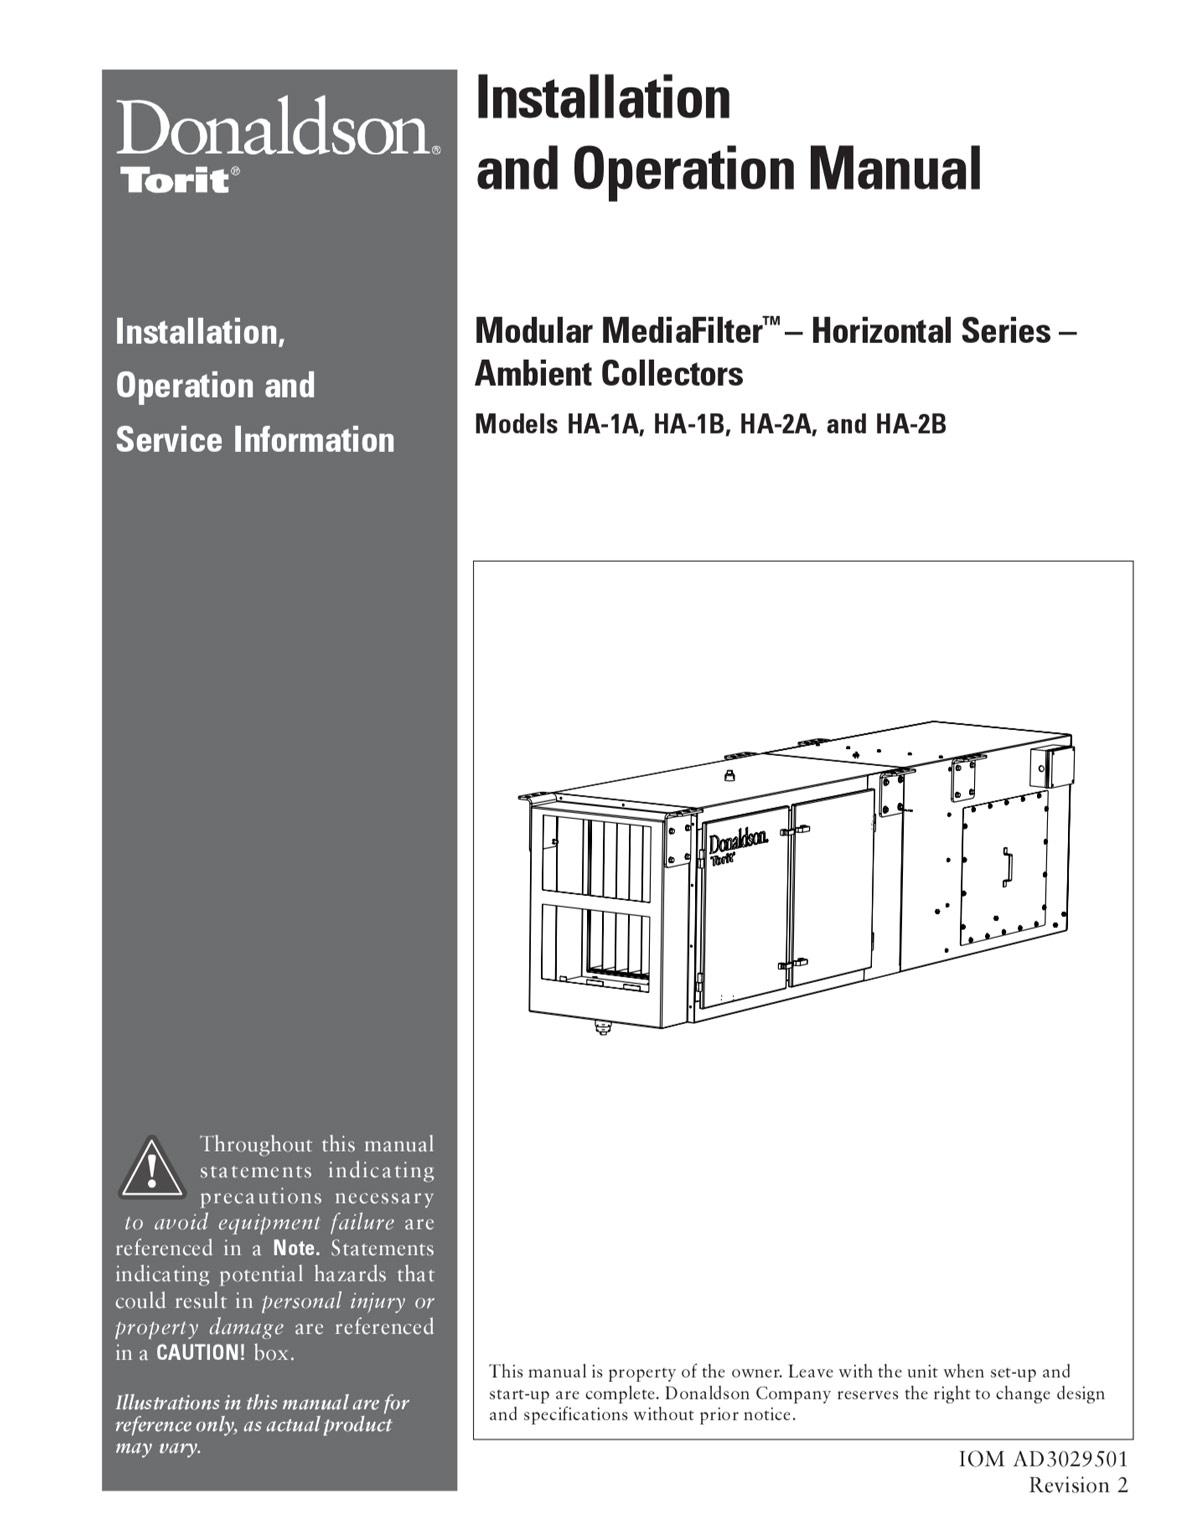 Modular MediaFilter - Horizontal - Ambient Collectors IOM